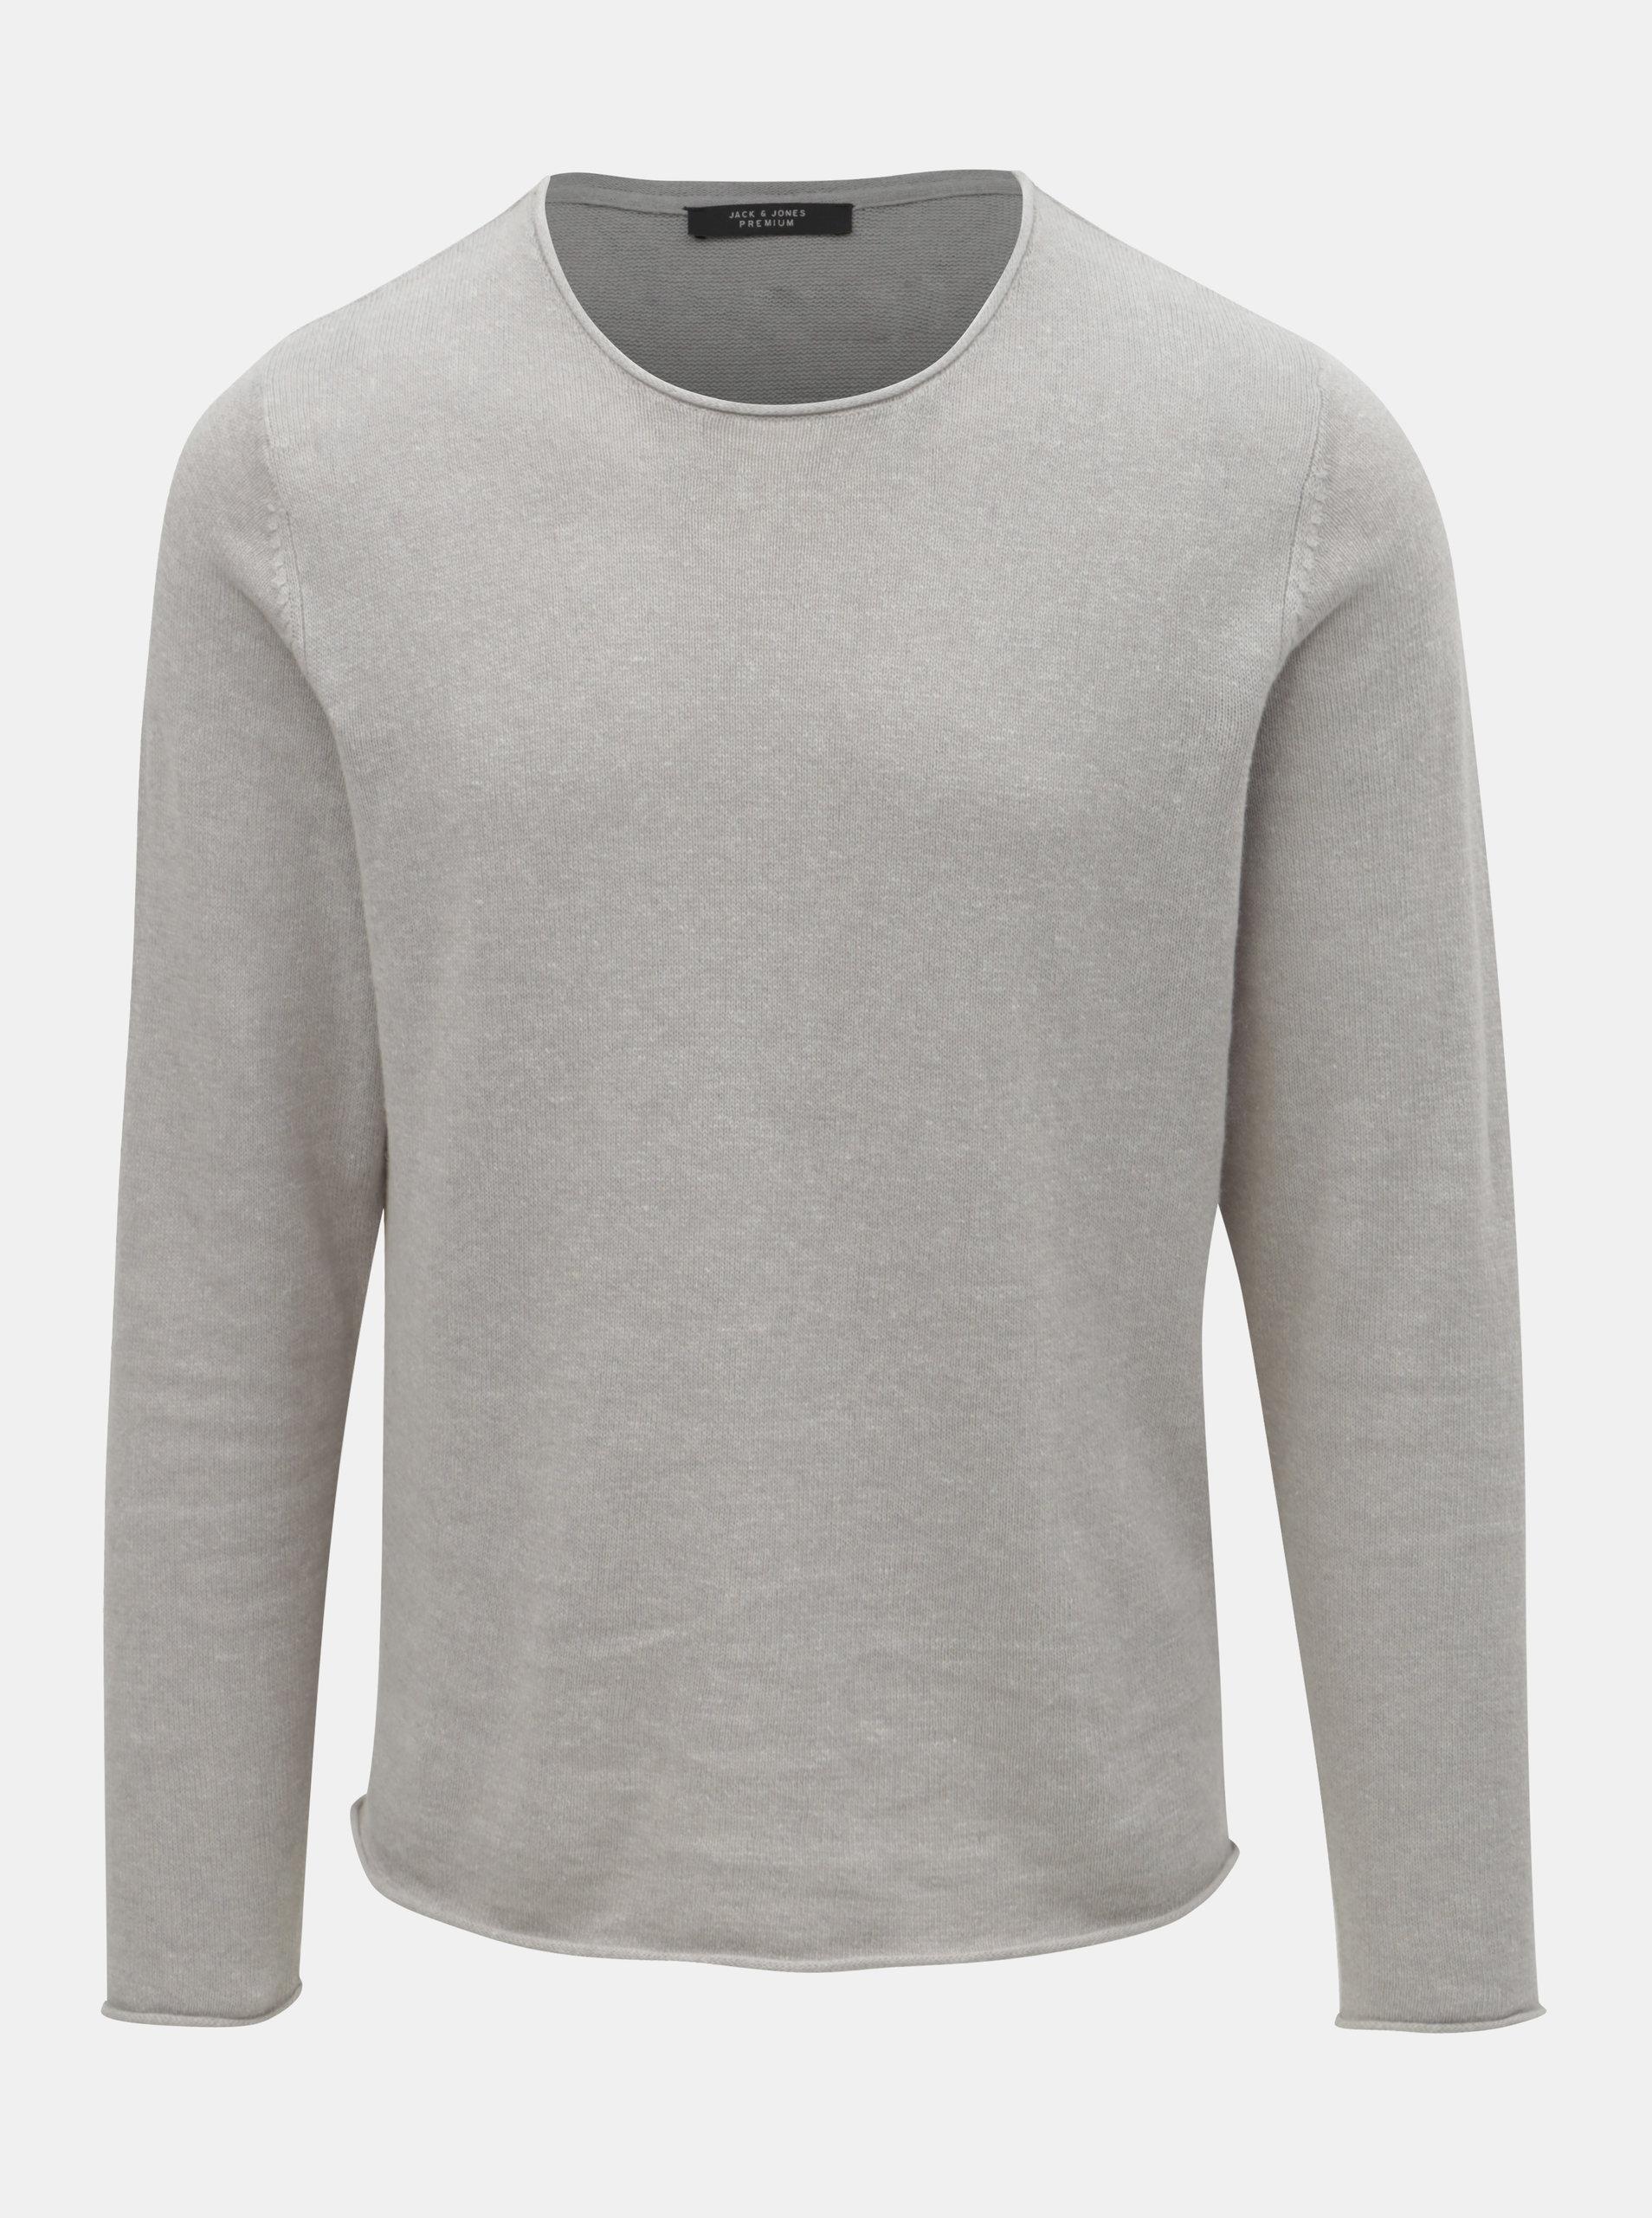 3e85e1cde0ba Svetlosivý ľanový sveter Jack   Jones Linen ...